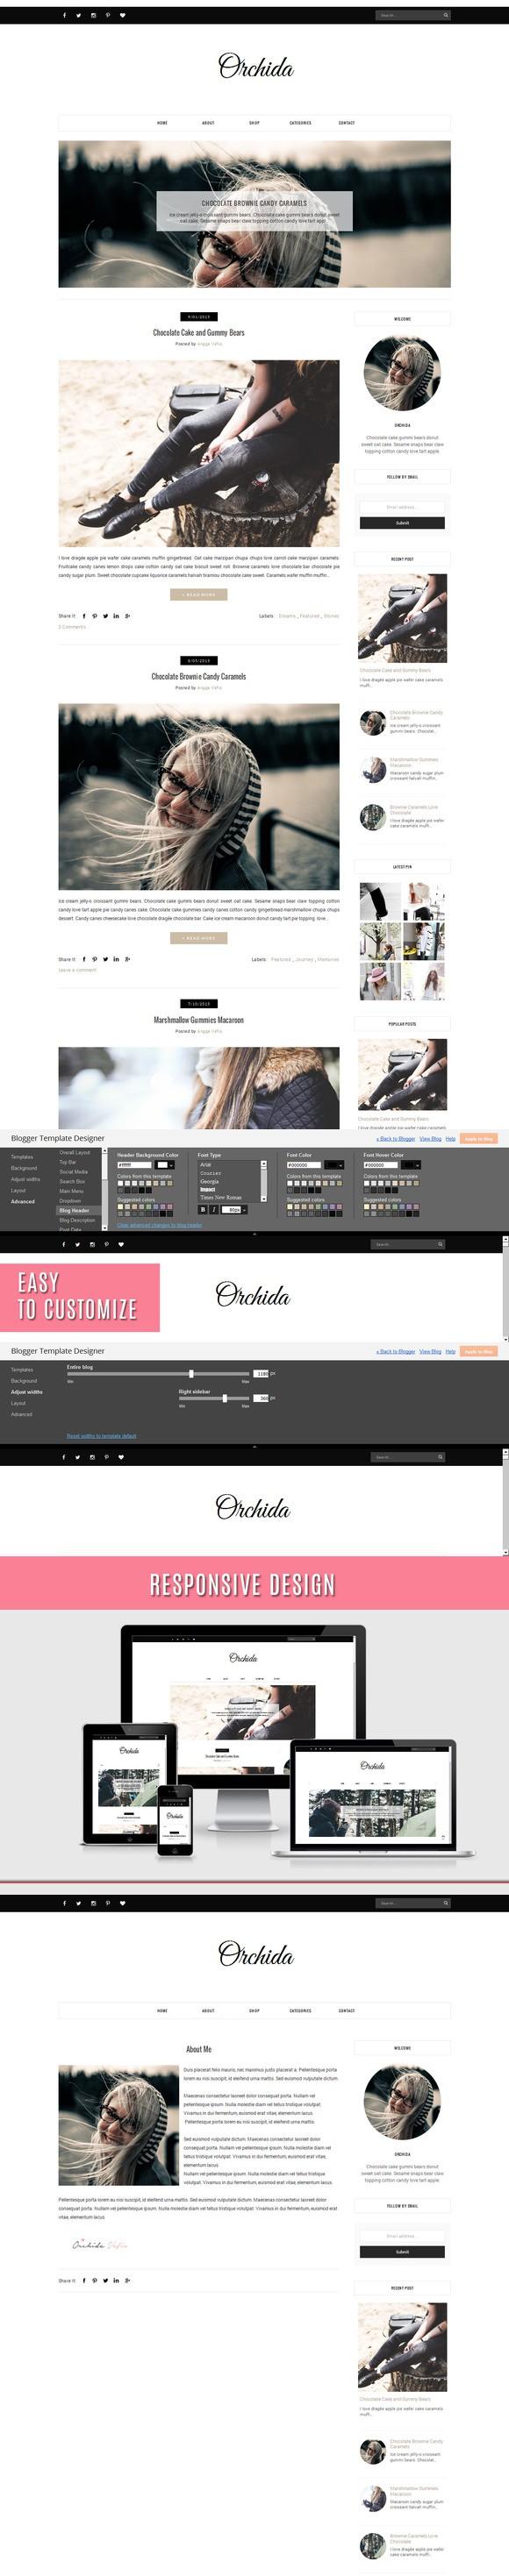 Blogger Template - Orchida. Google Slides Templates. $13.00   Google ...